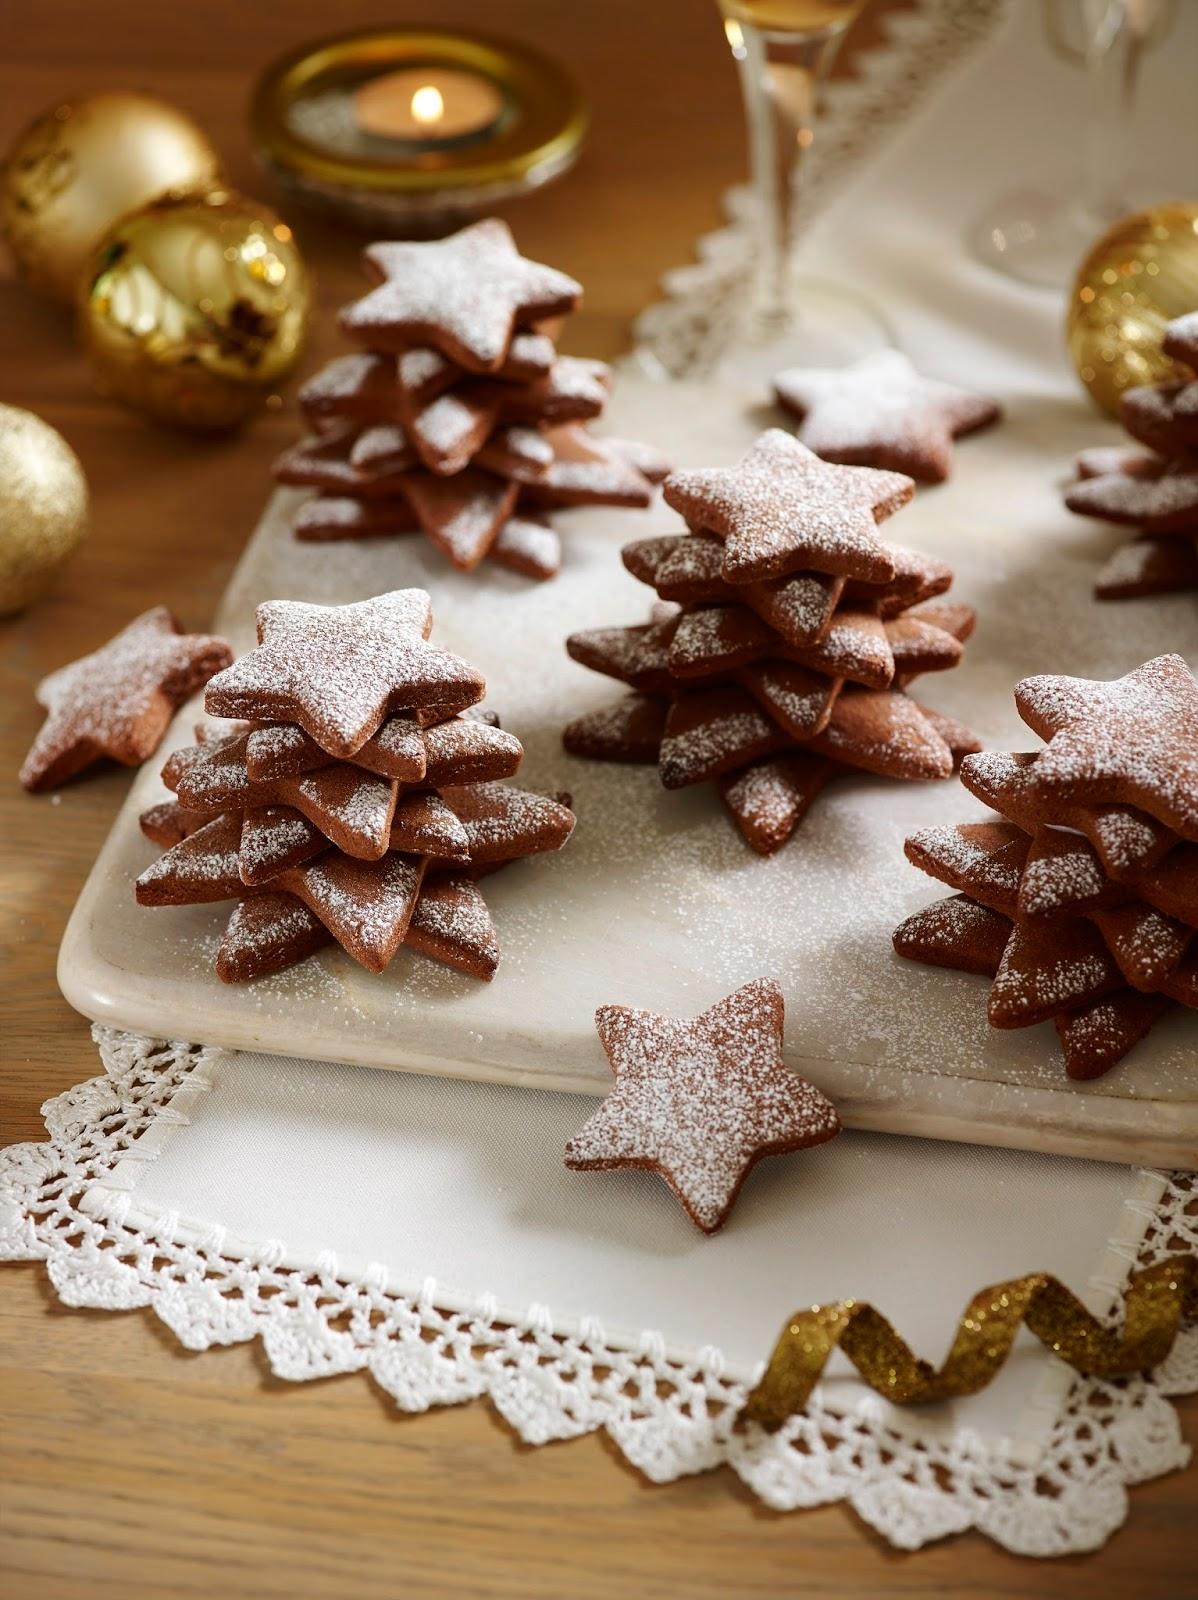 Potter's Chocolate And Cinnamon Malt Biscuit Stars